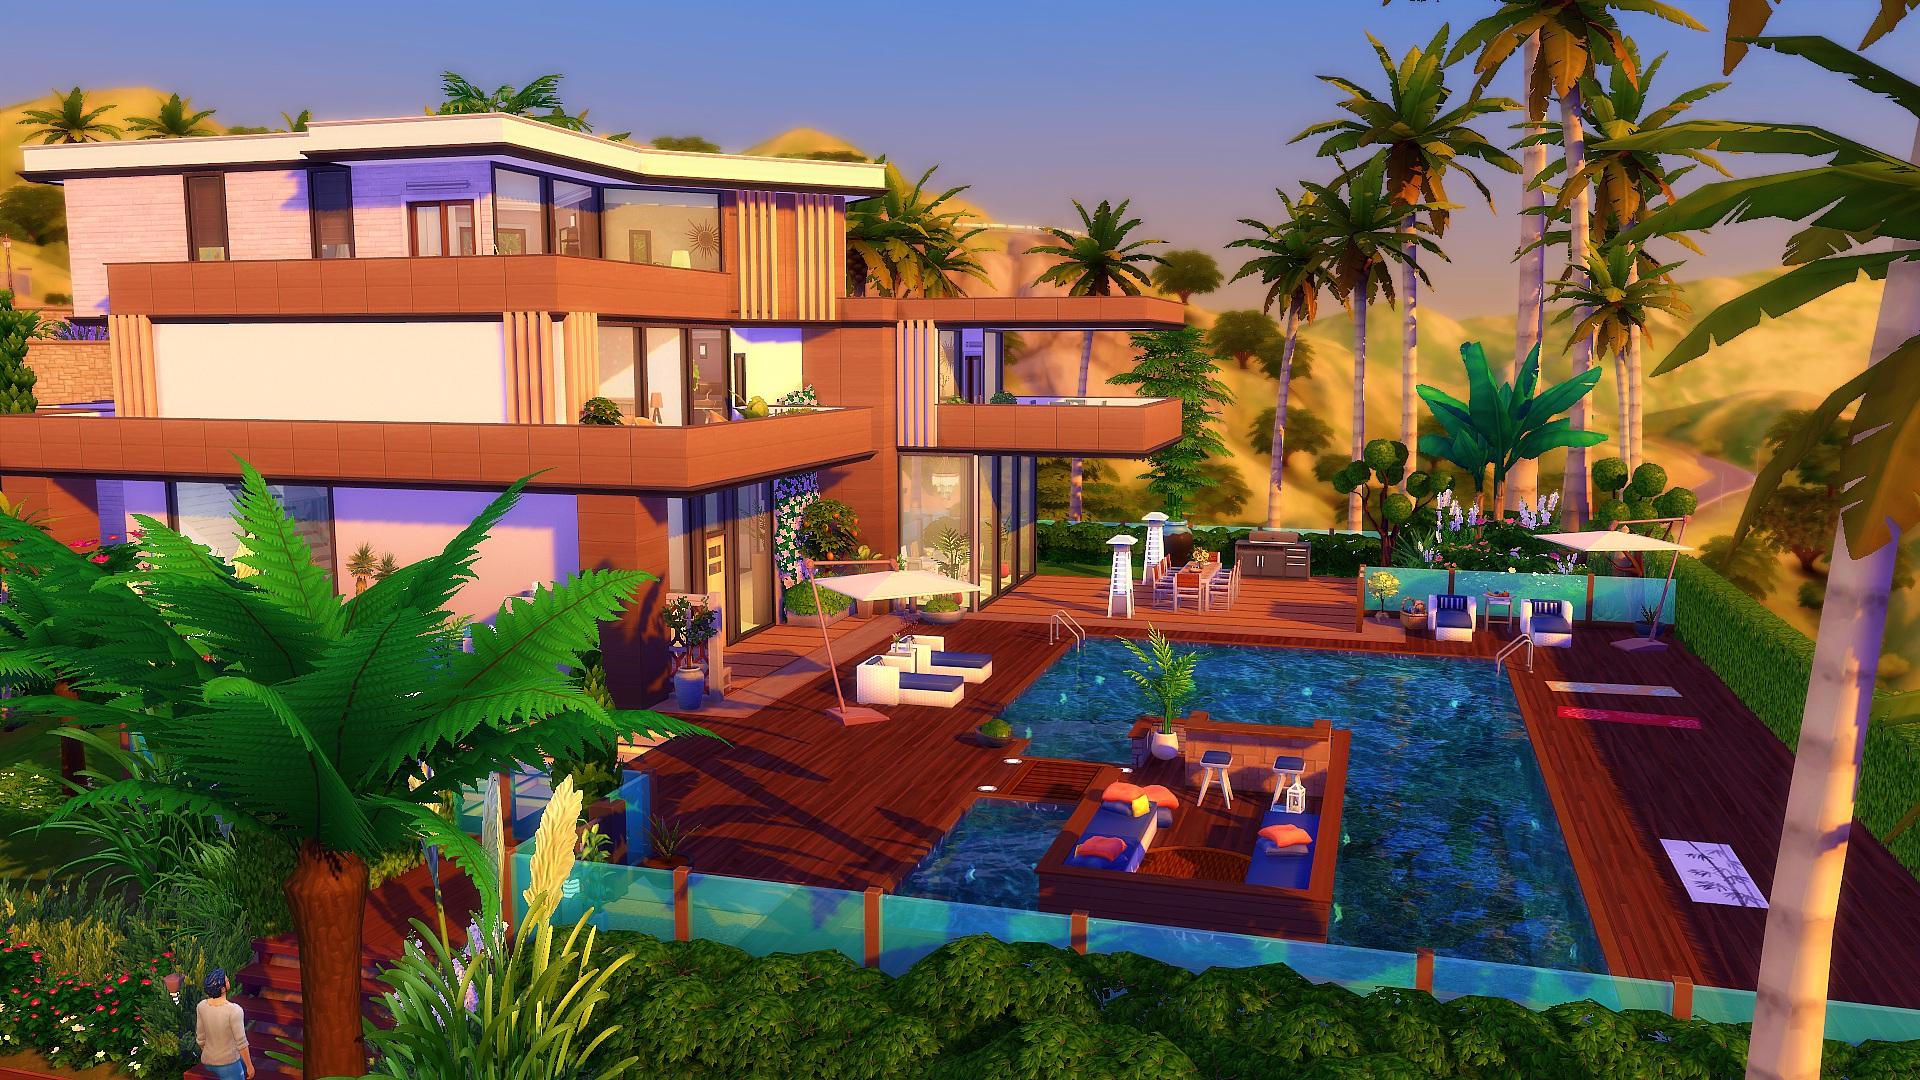 maison moderne sims 4 - StudioSims Creation